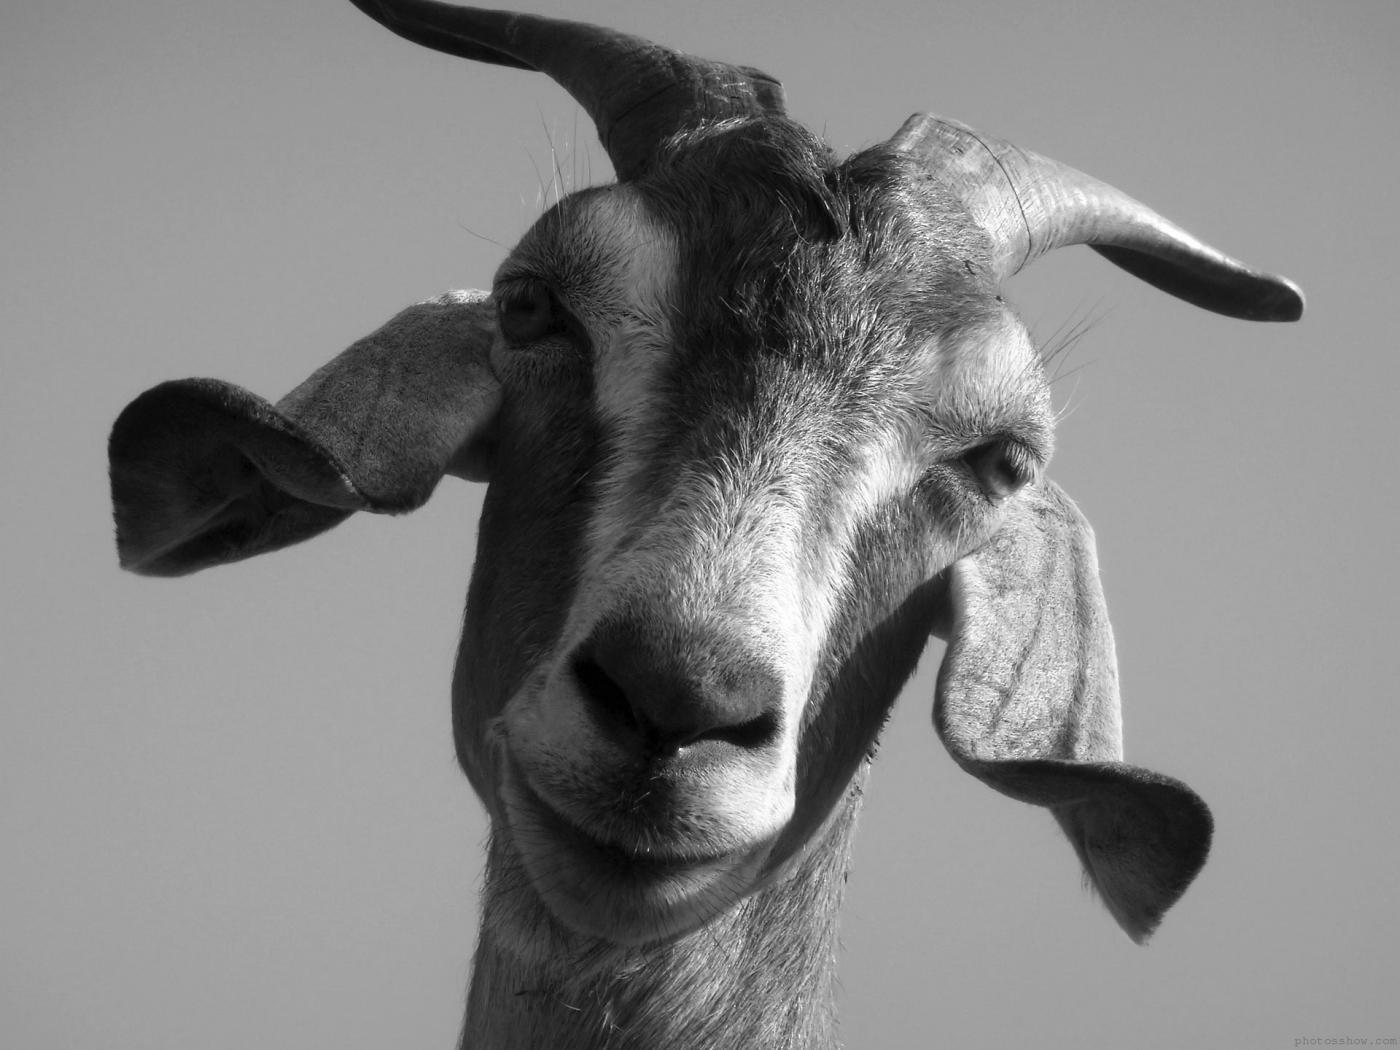 goat-domestic-free-hd-images-129584.jpg